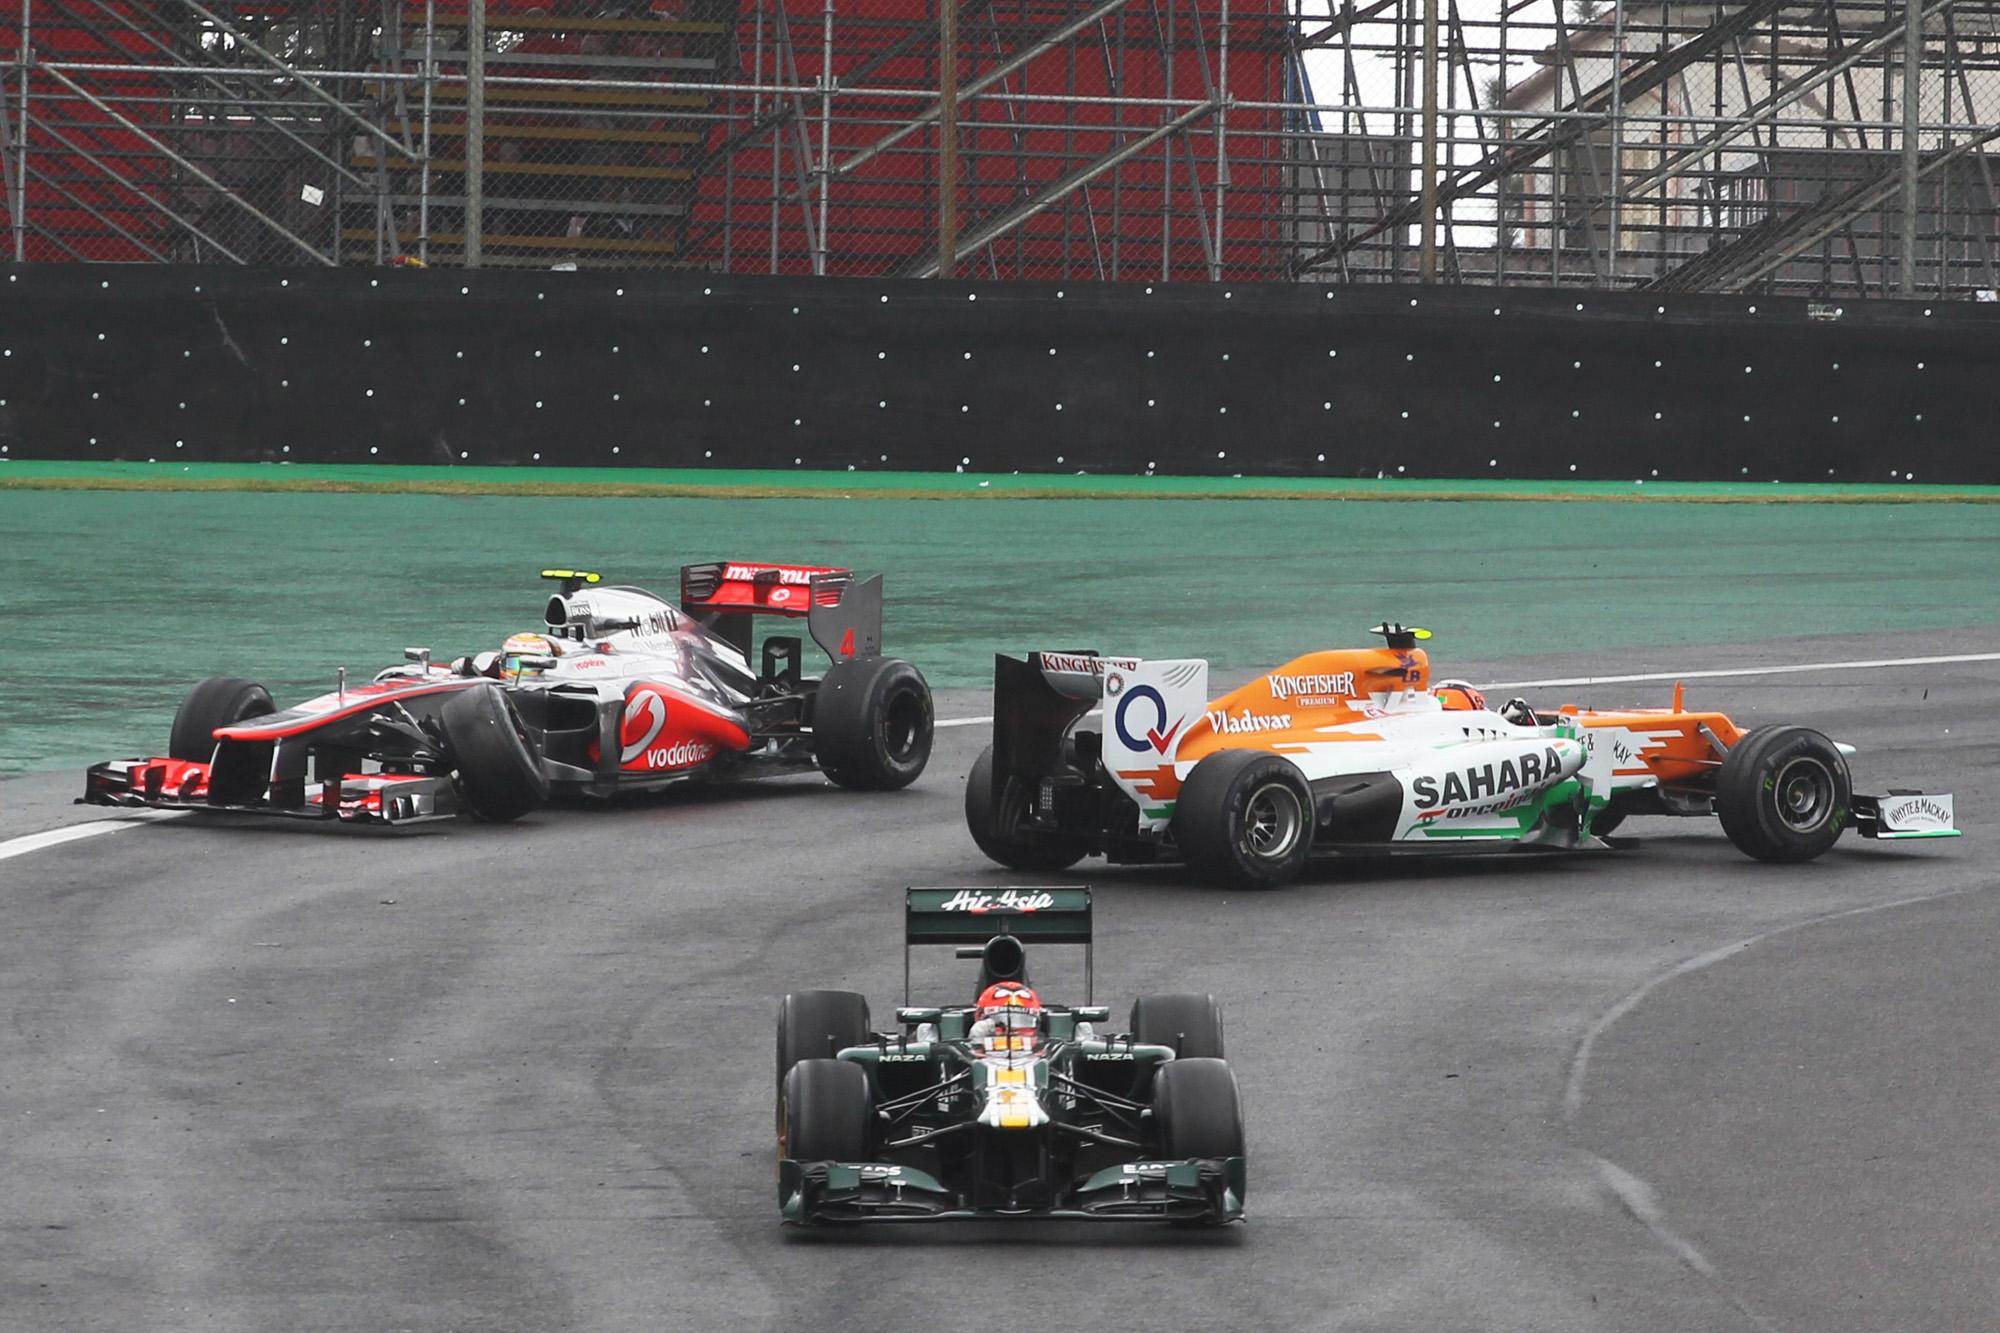 Nico Hulkenberg Lewis Hamilton Brazilian Grand prix 2012 crash F1 Interlagos McLaren Force India